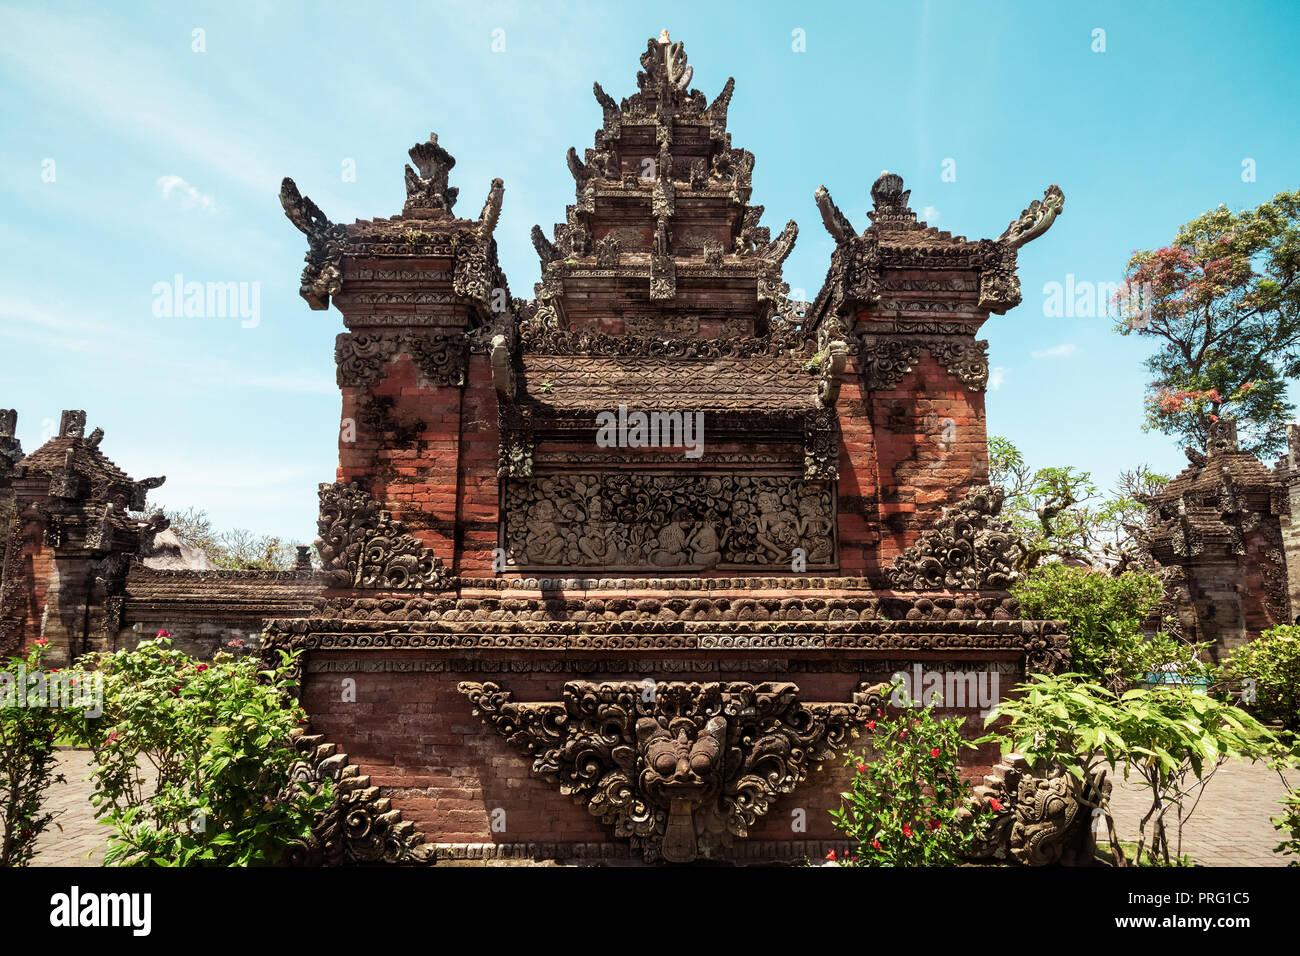 Puseh Batuan Tempel auf Bali, Indonesien. Stockfoto